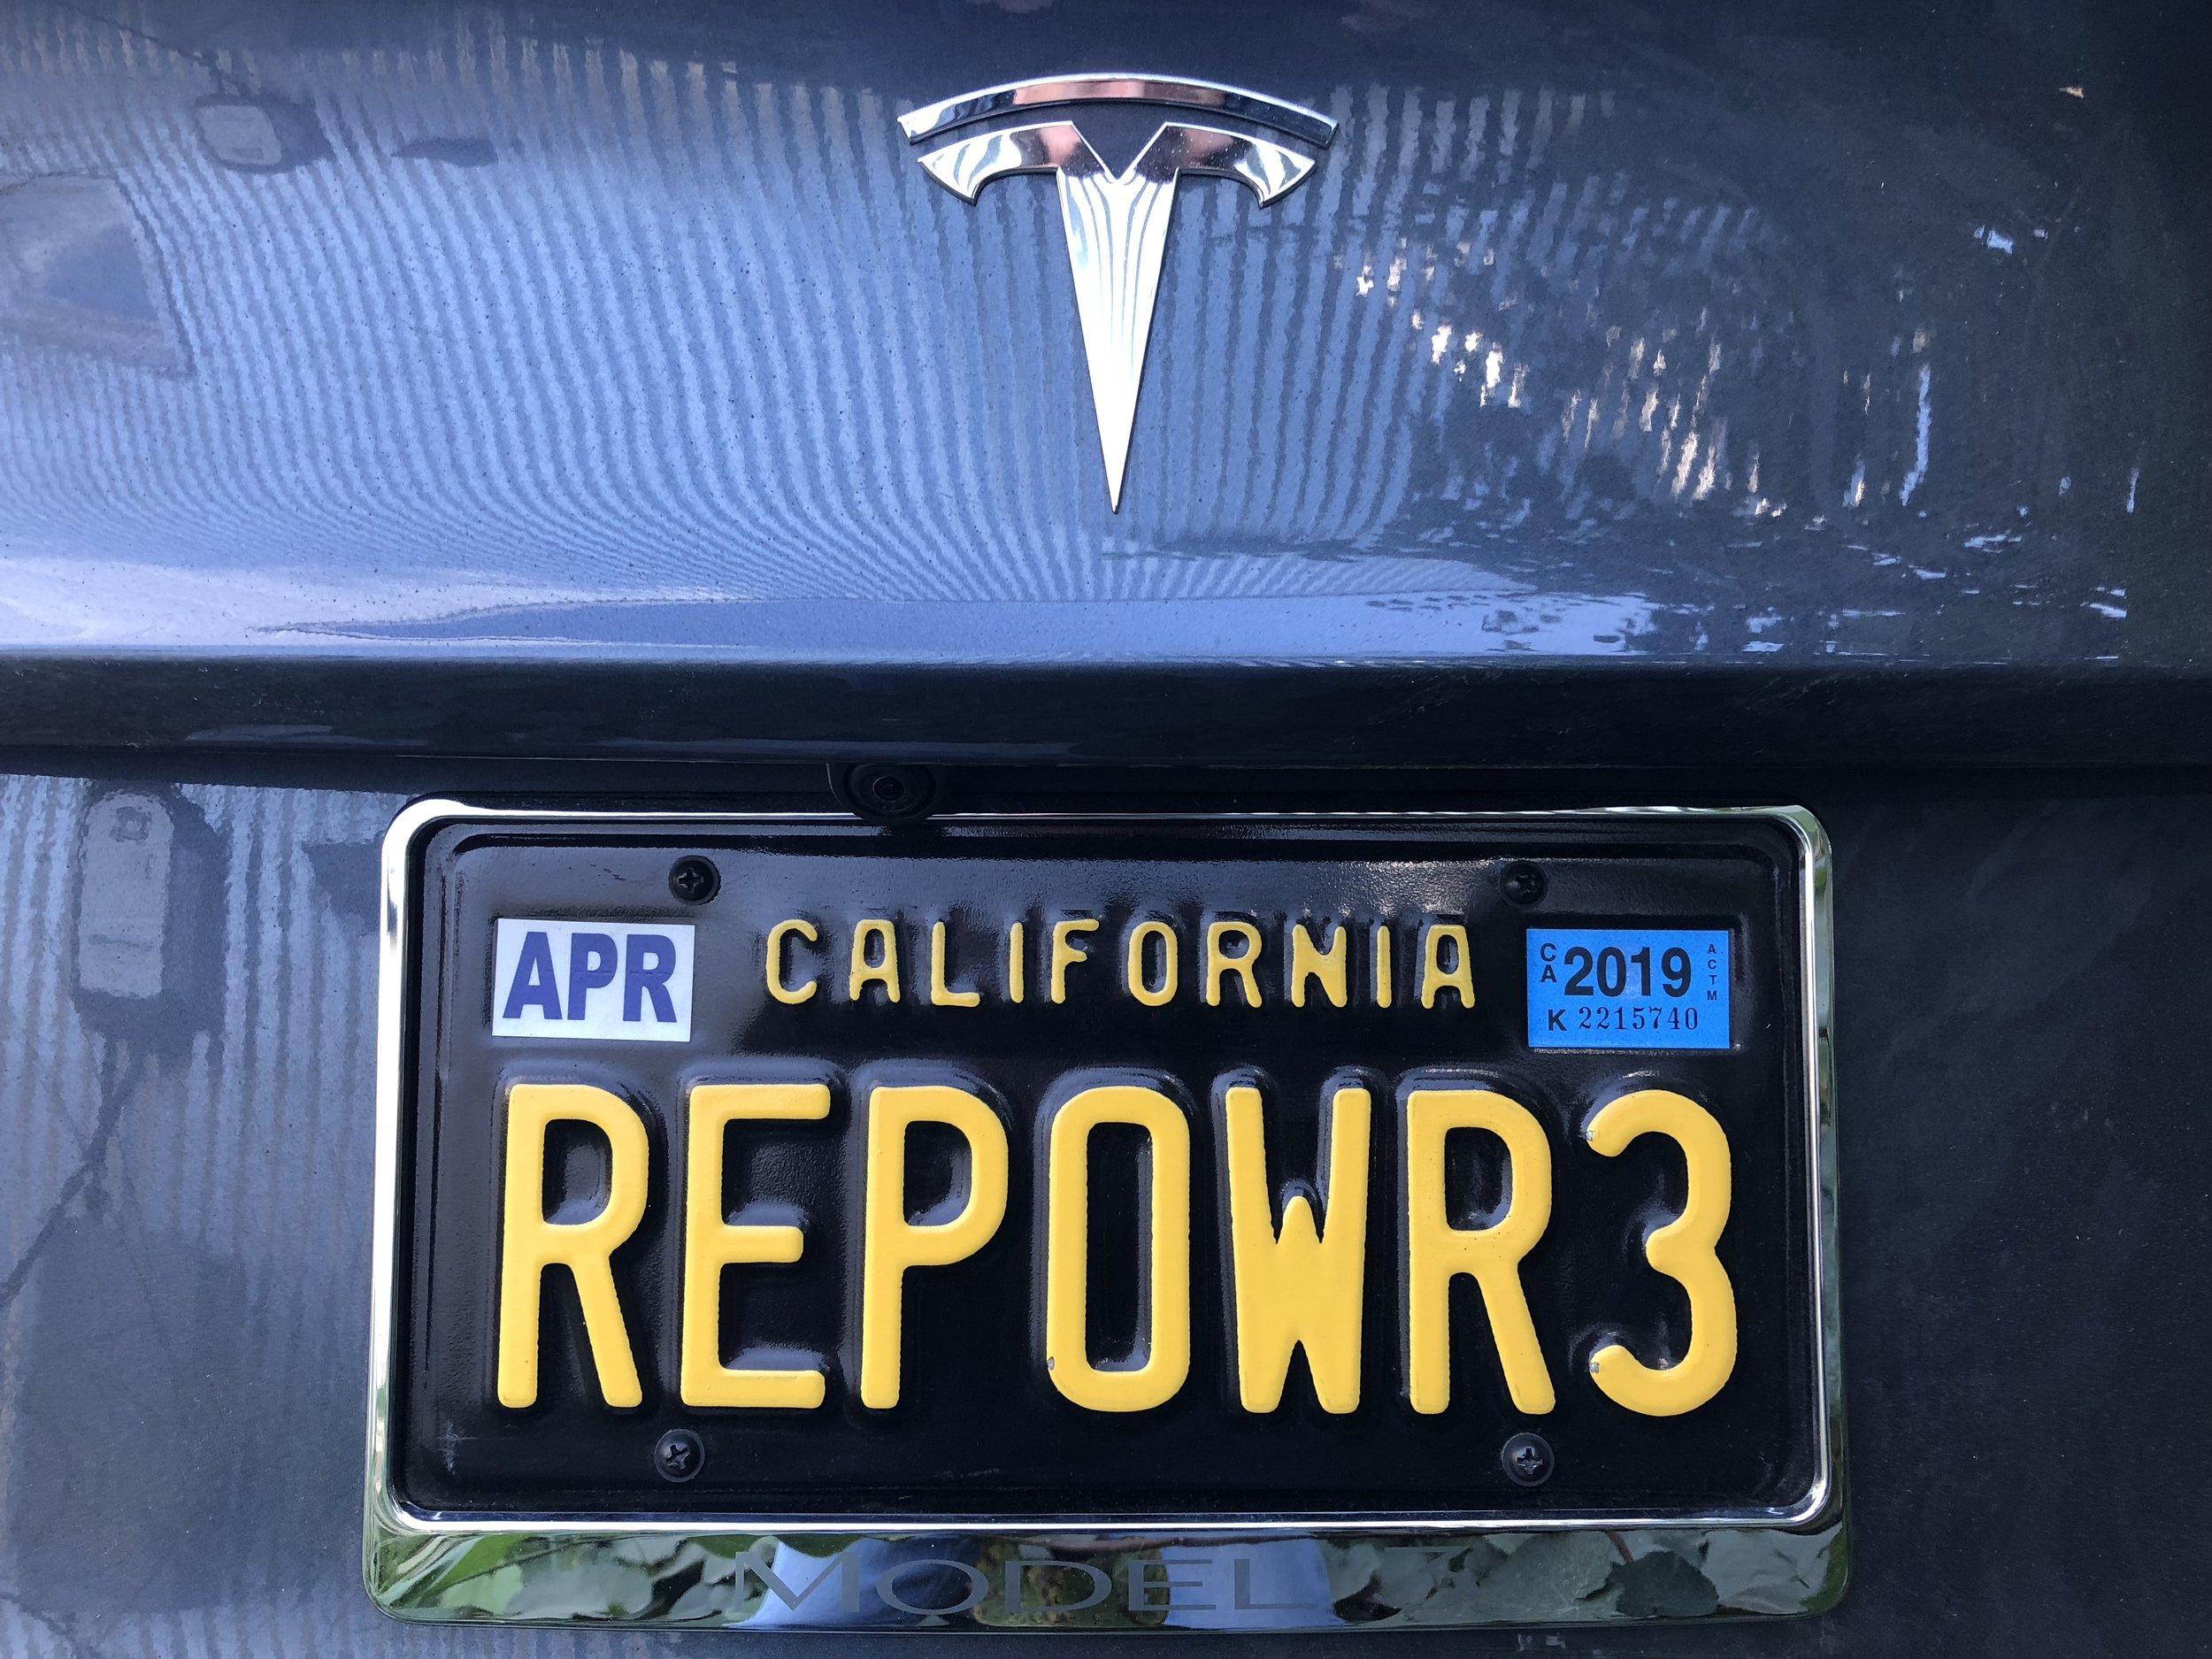 REPOWR3.JPG